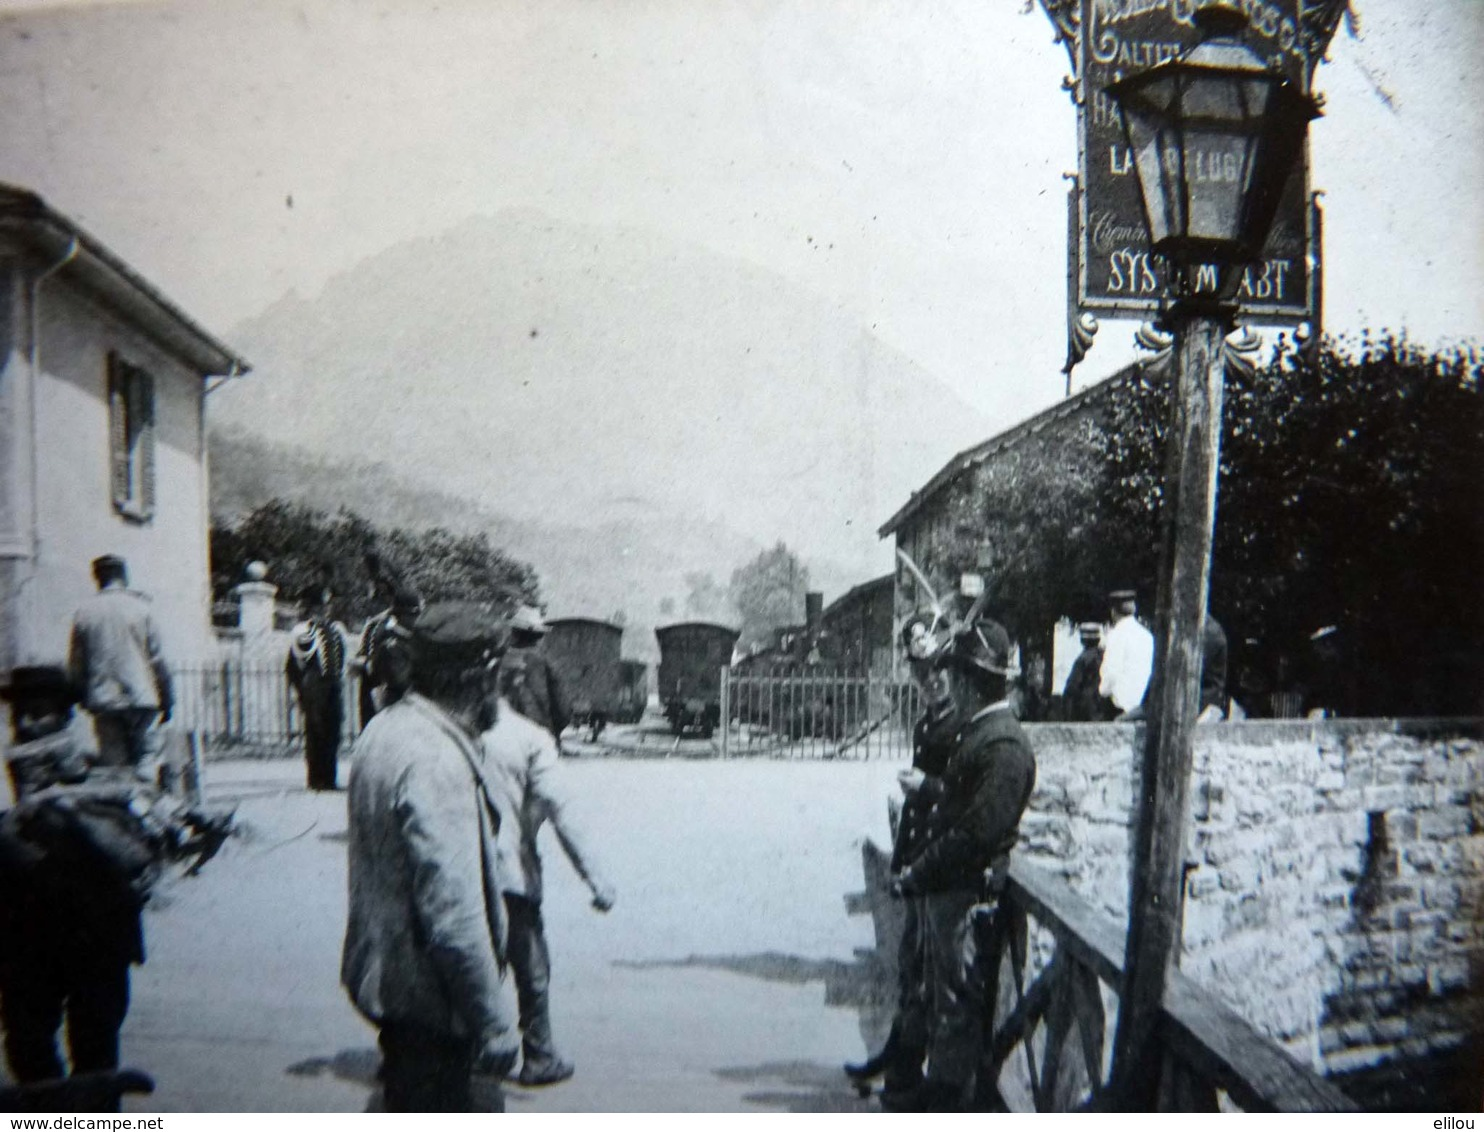 Rare! Belle Photo Ancienne Vers 1890 Monte Generoso Gare Train Italie Italia Suisse Switzeland - Photographs